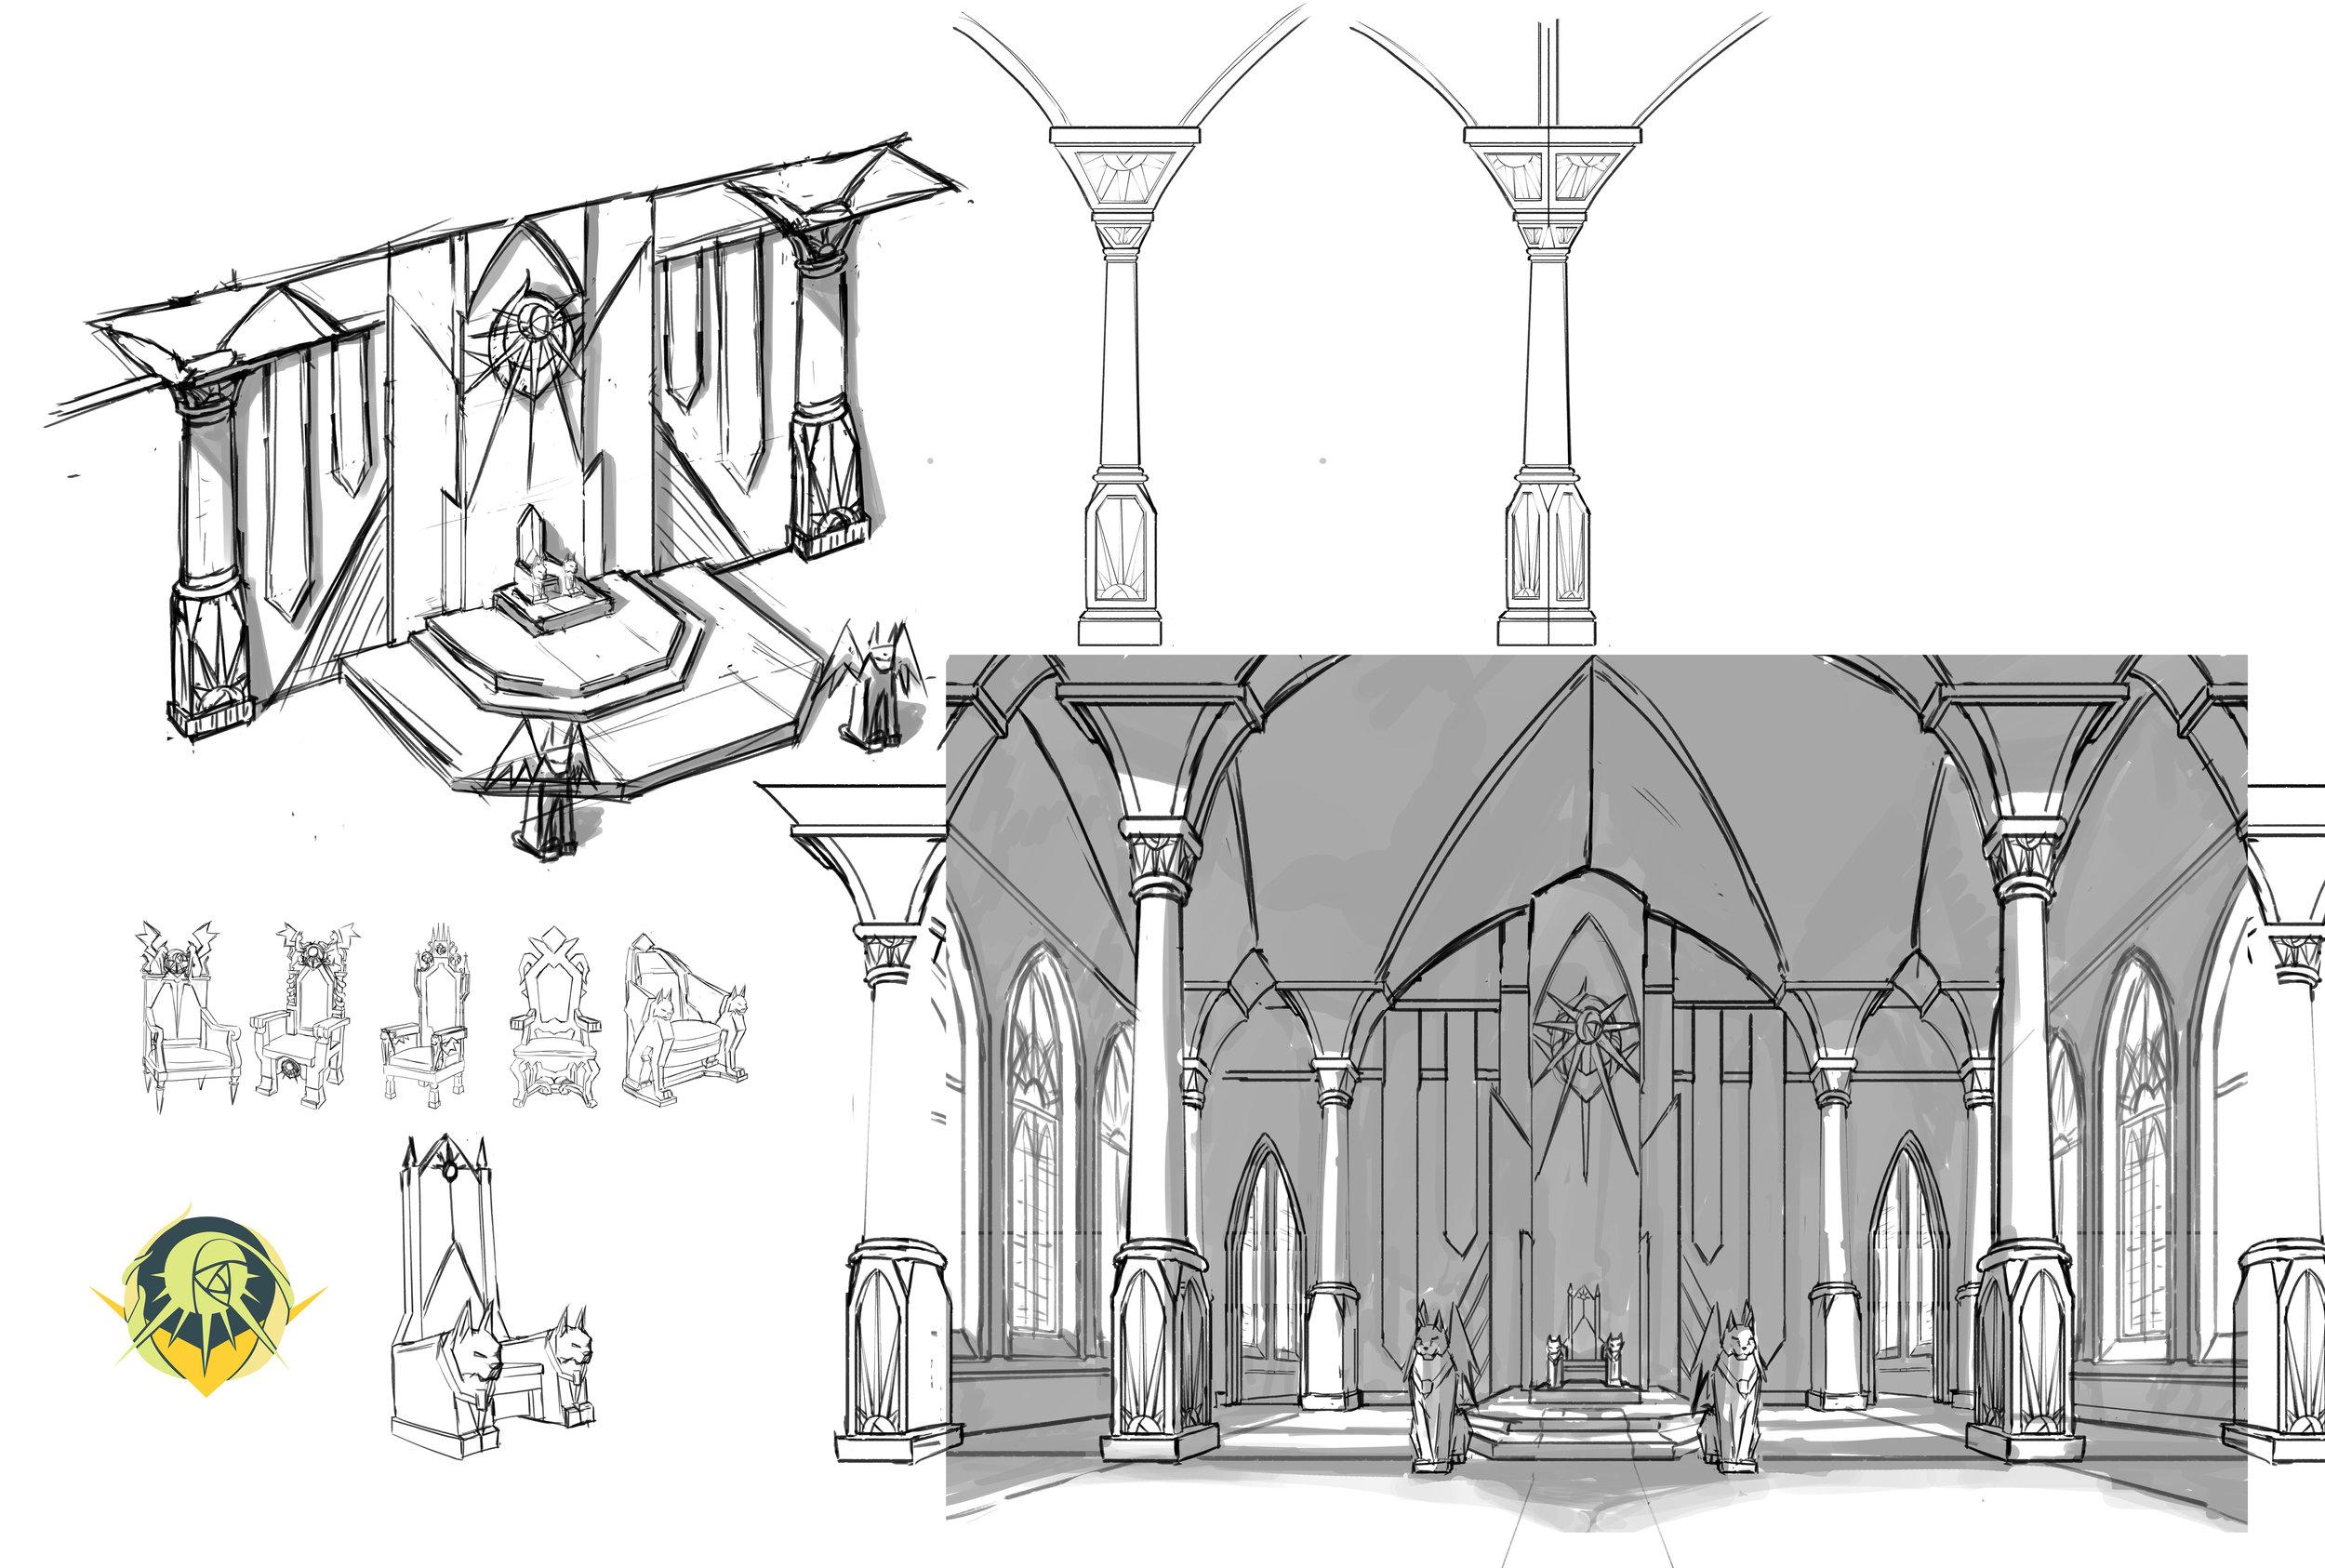 Project: Rumple, Hall